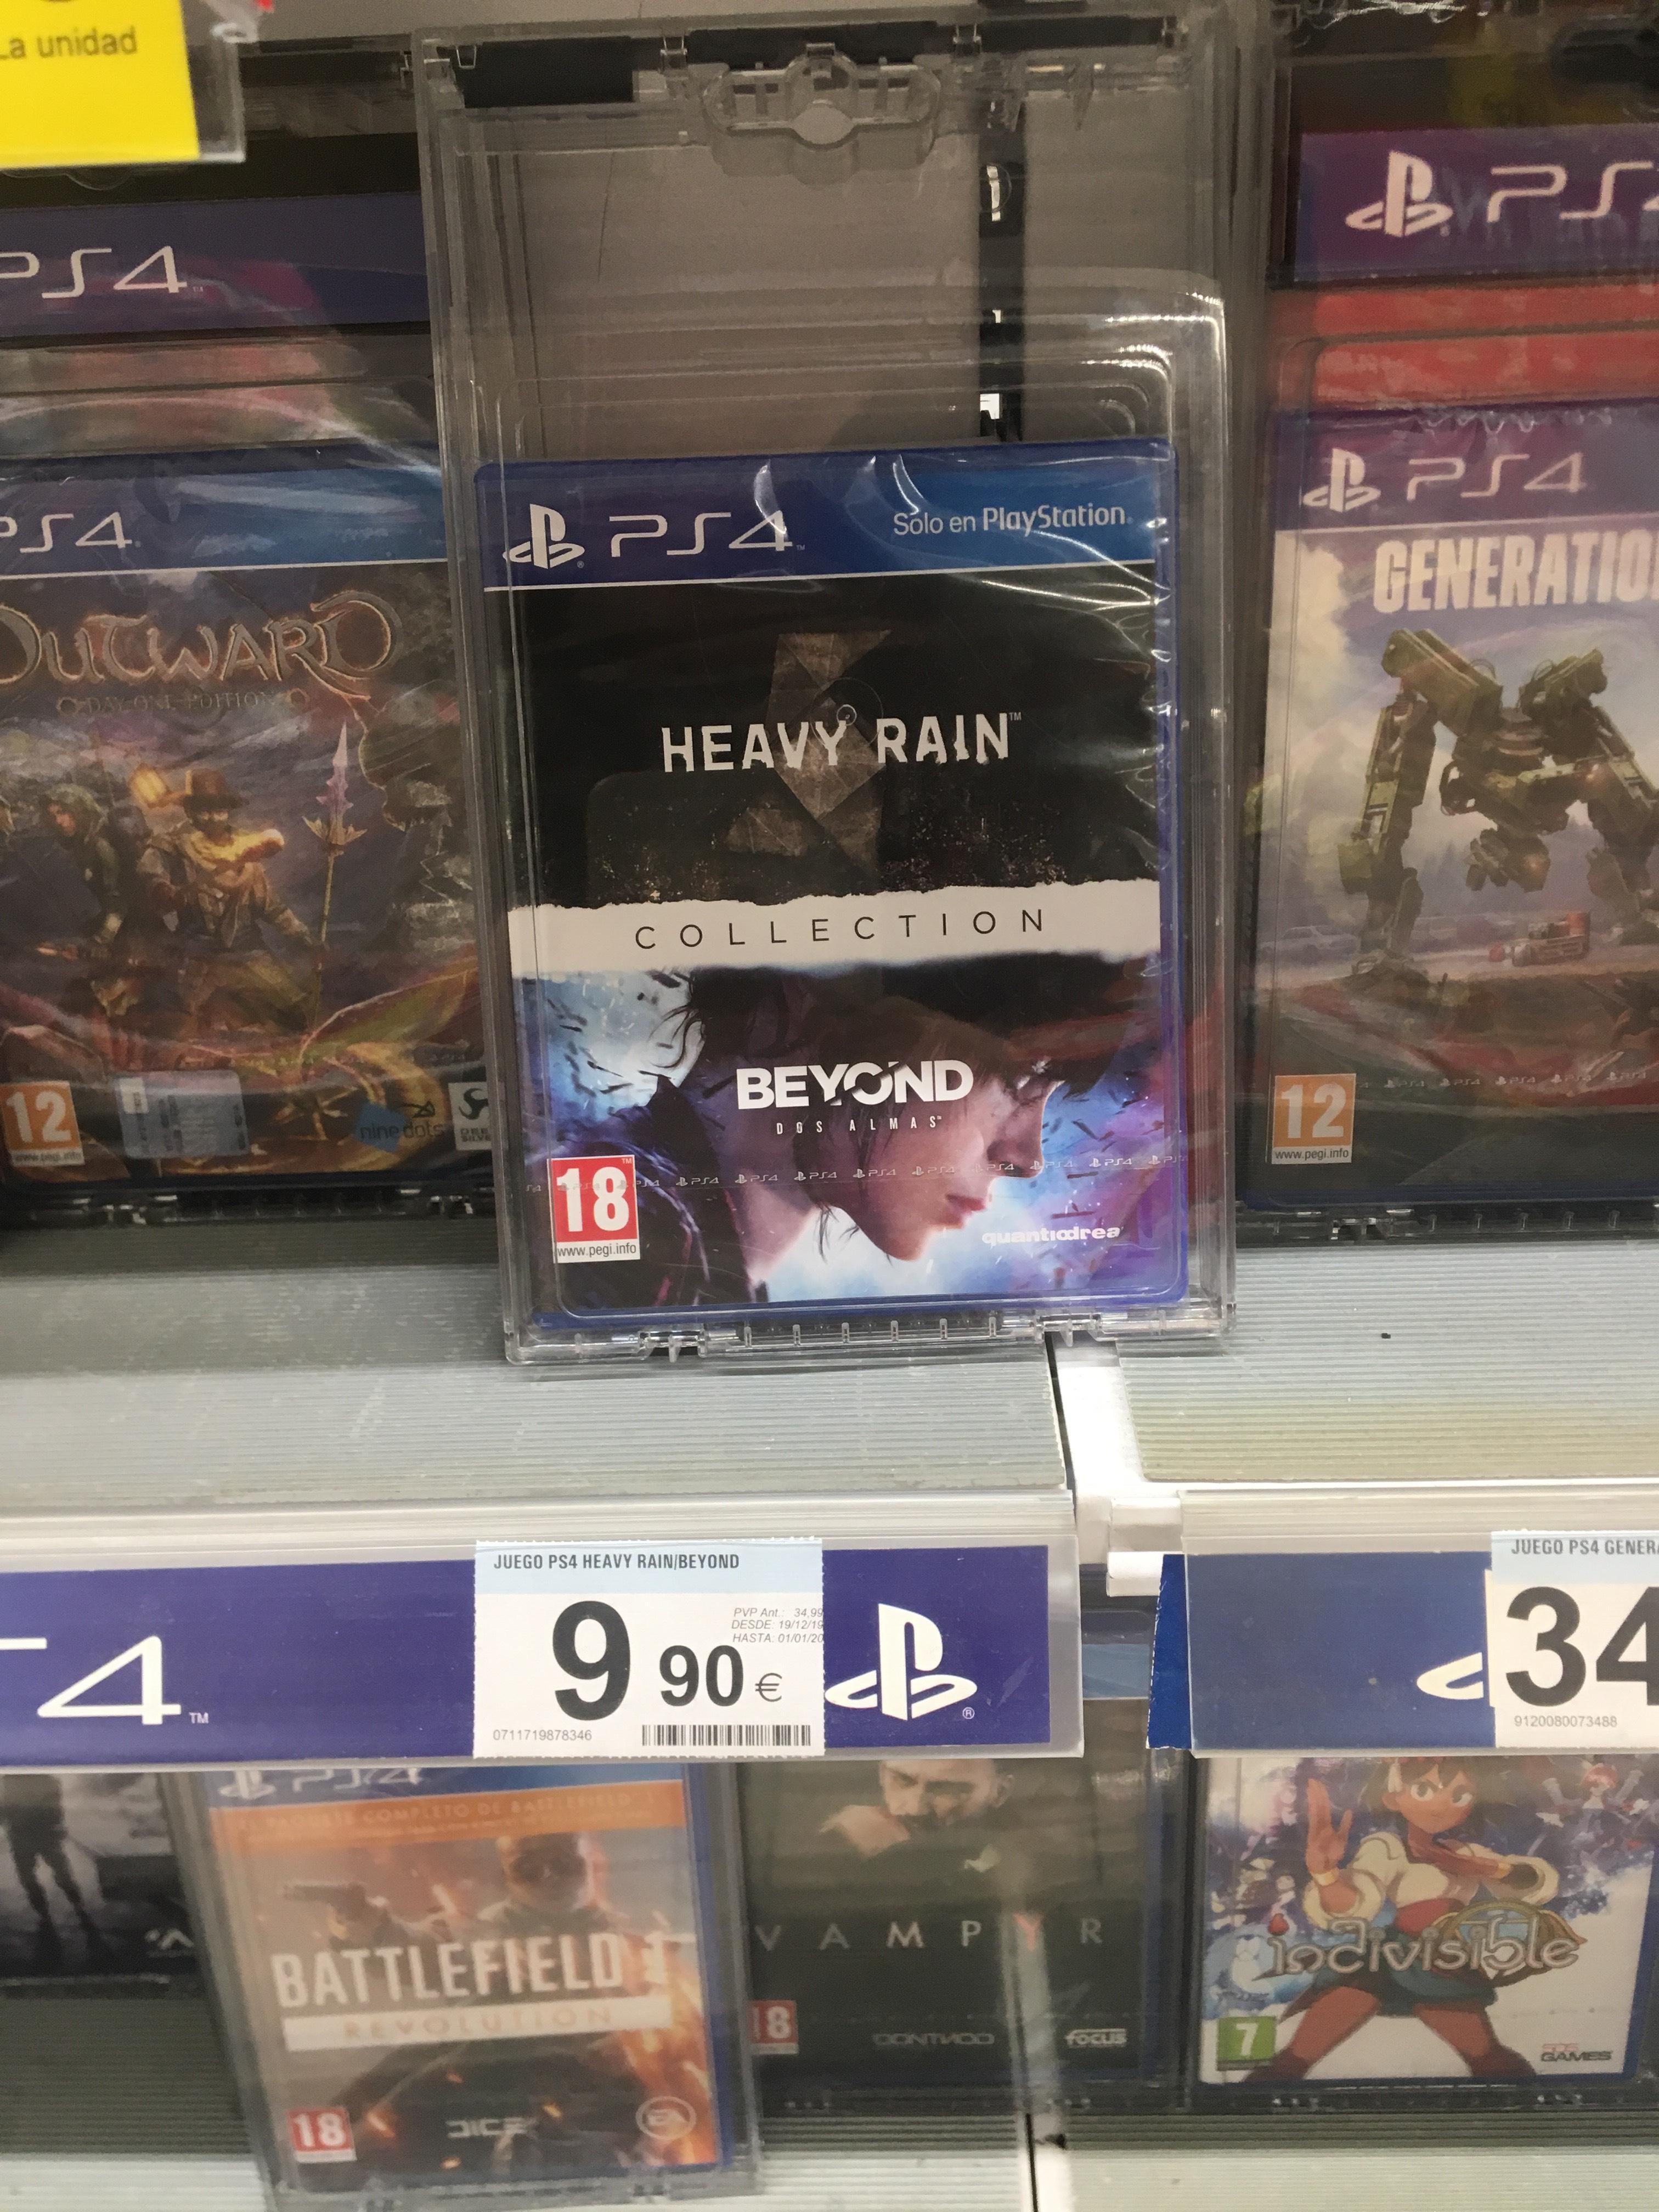 Juego PS4 Heavy rain & Beyound colection